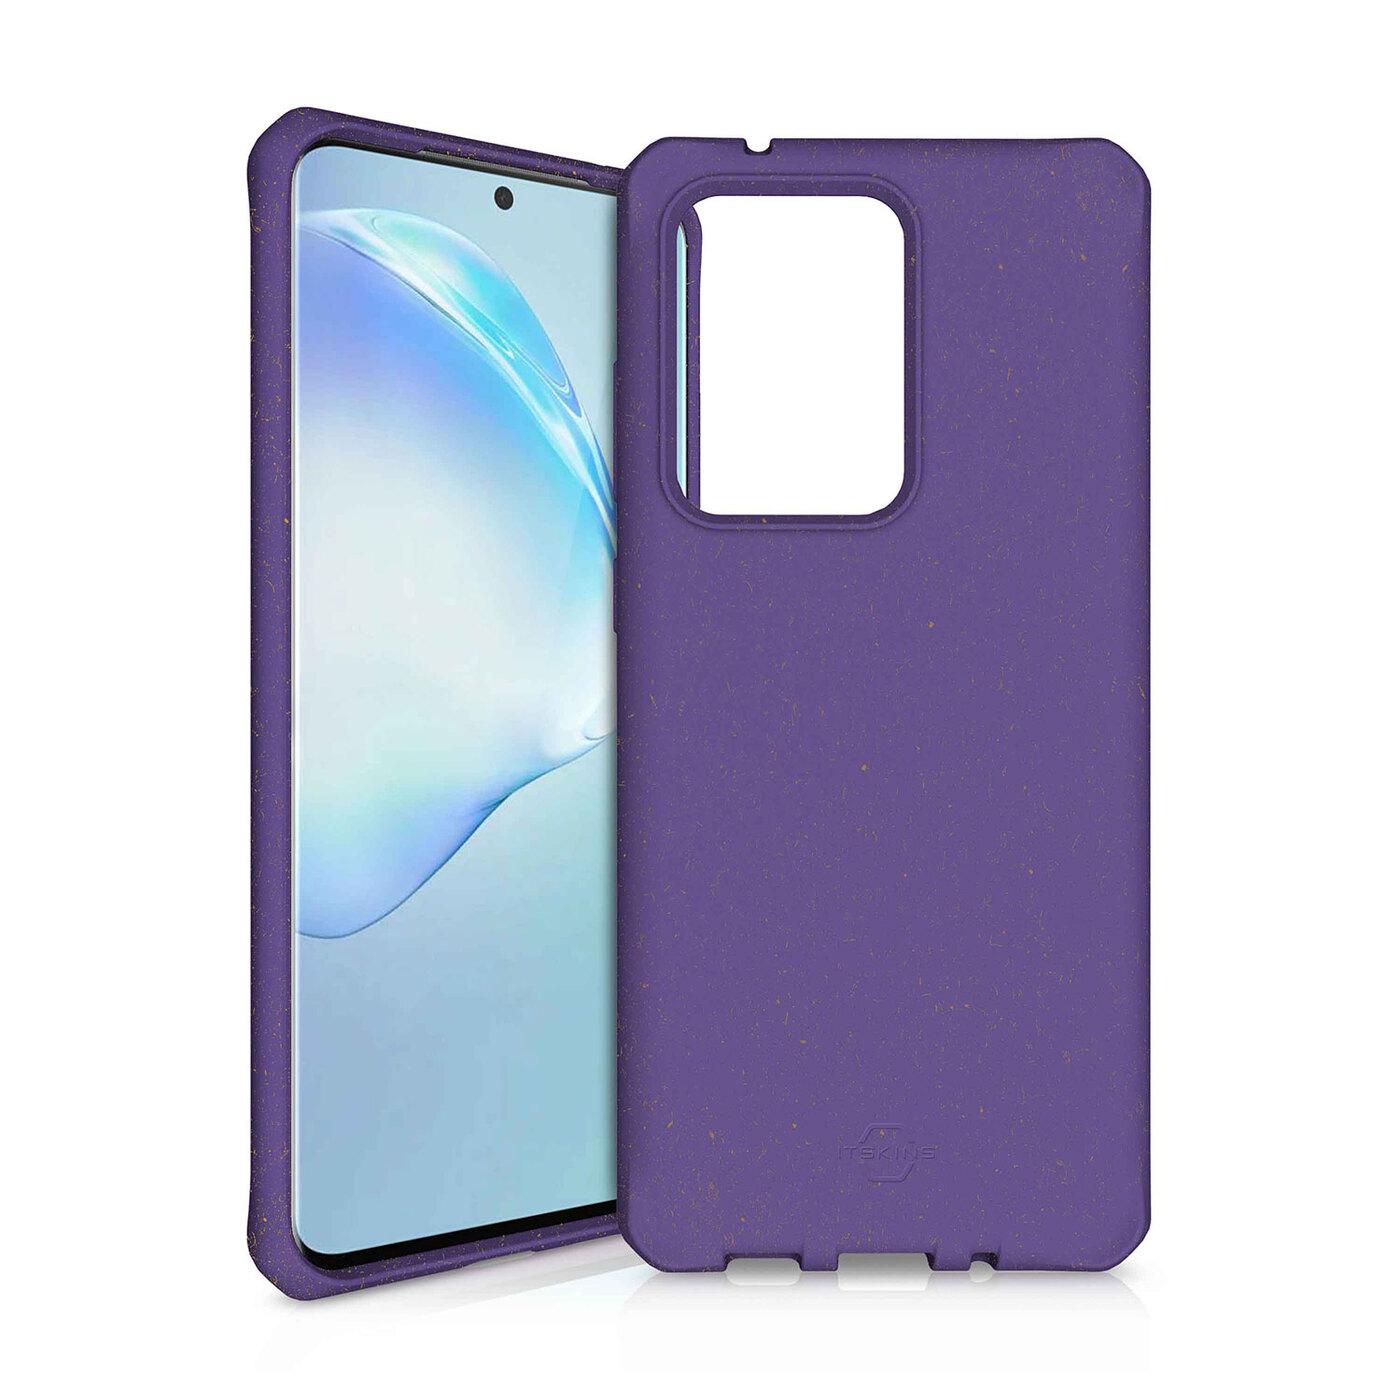 Чехол-накладка ITSKINS FERONIA BIO для Samsung Galaxy S20 Ultra, фиолетовый